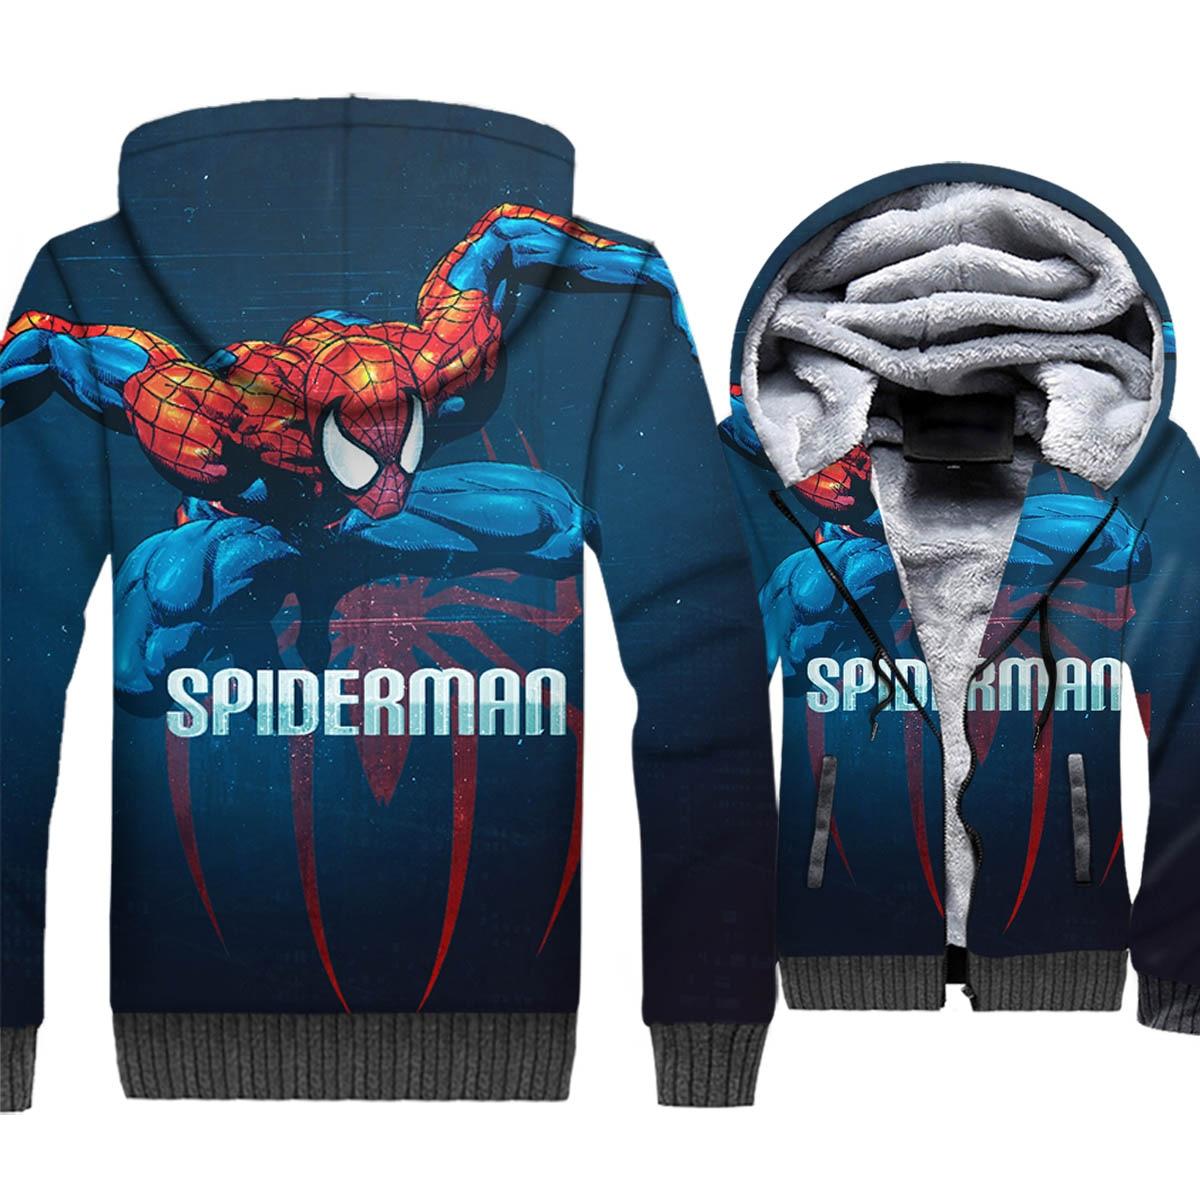 Spiderman Thick 3D Hoodies New 2019 Winter Warm Jackets Men Casual Sweatshirt Long Sleeve Hooded Men's Fashion Brand Clothing